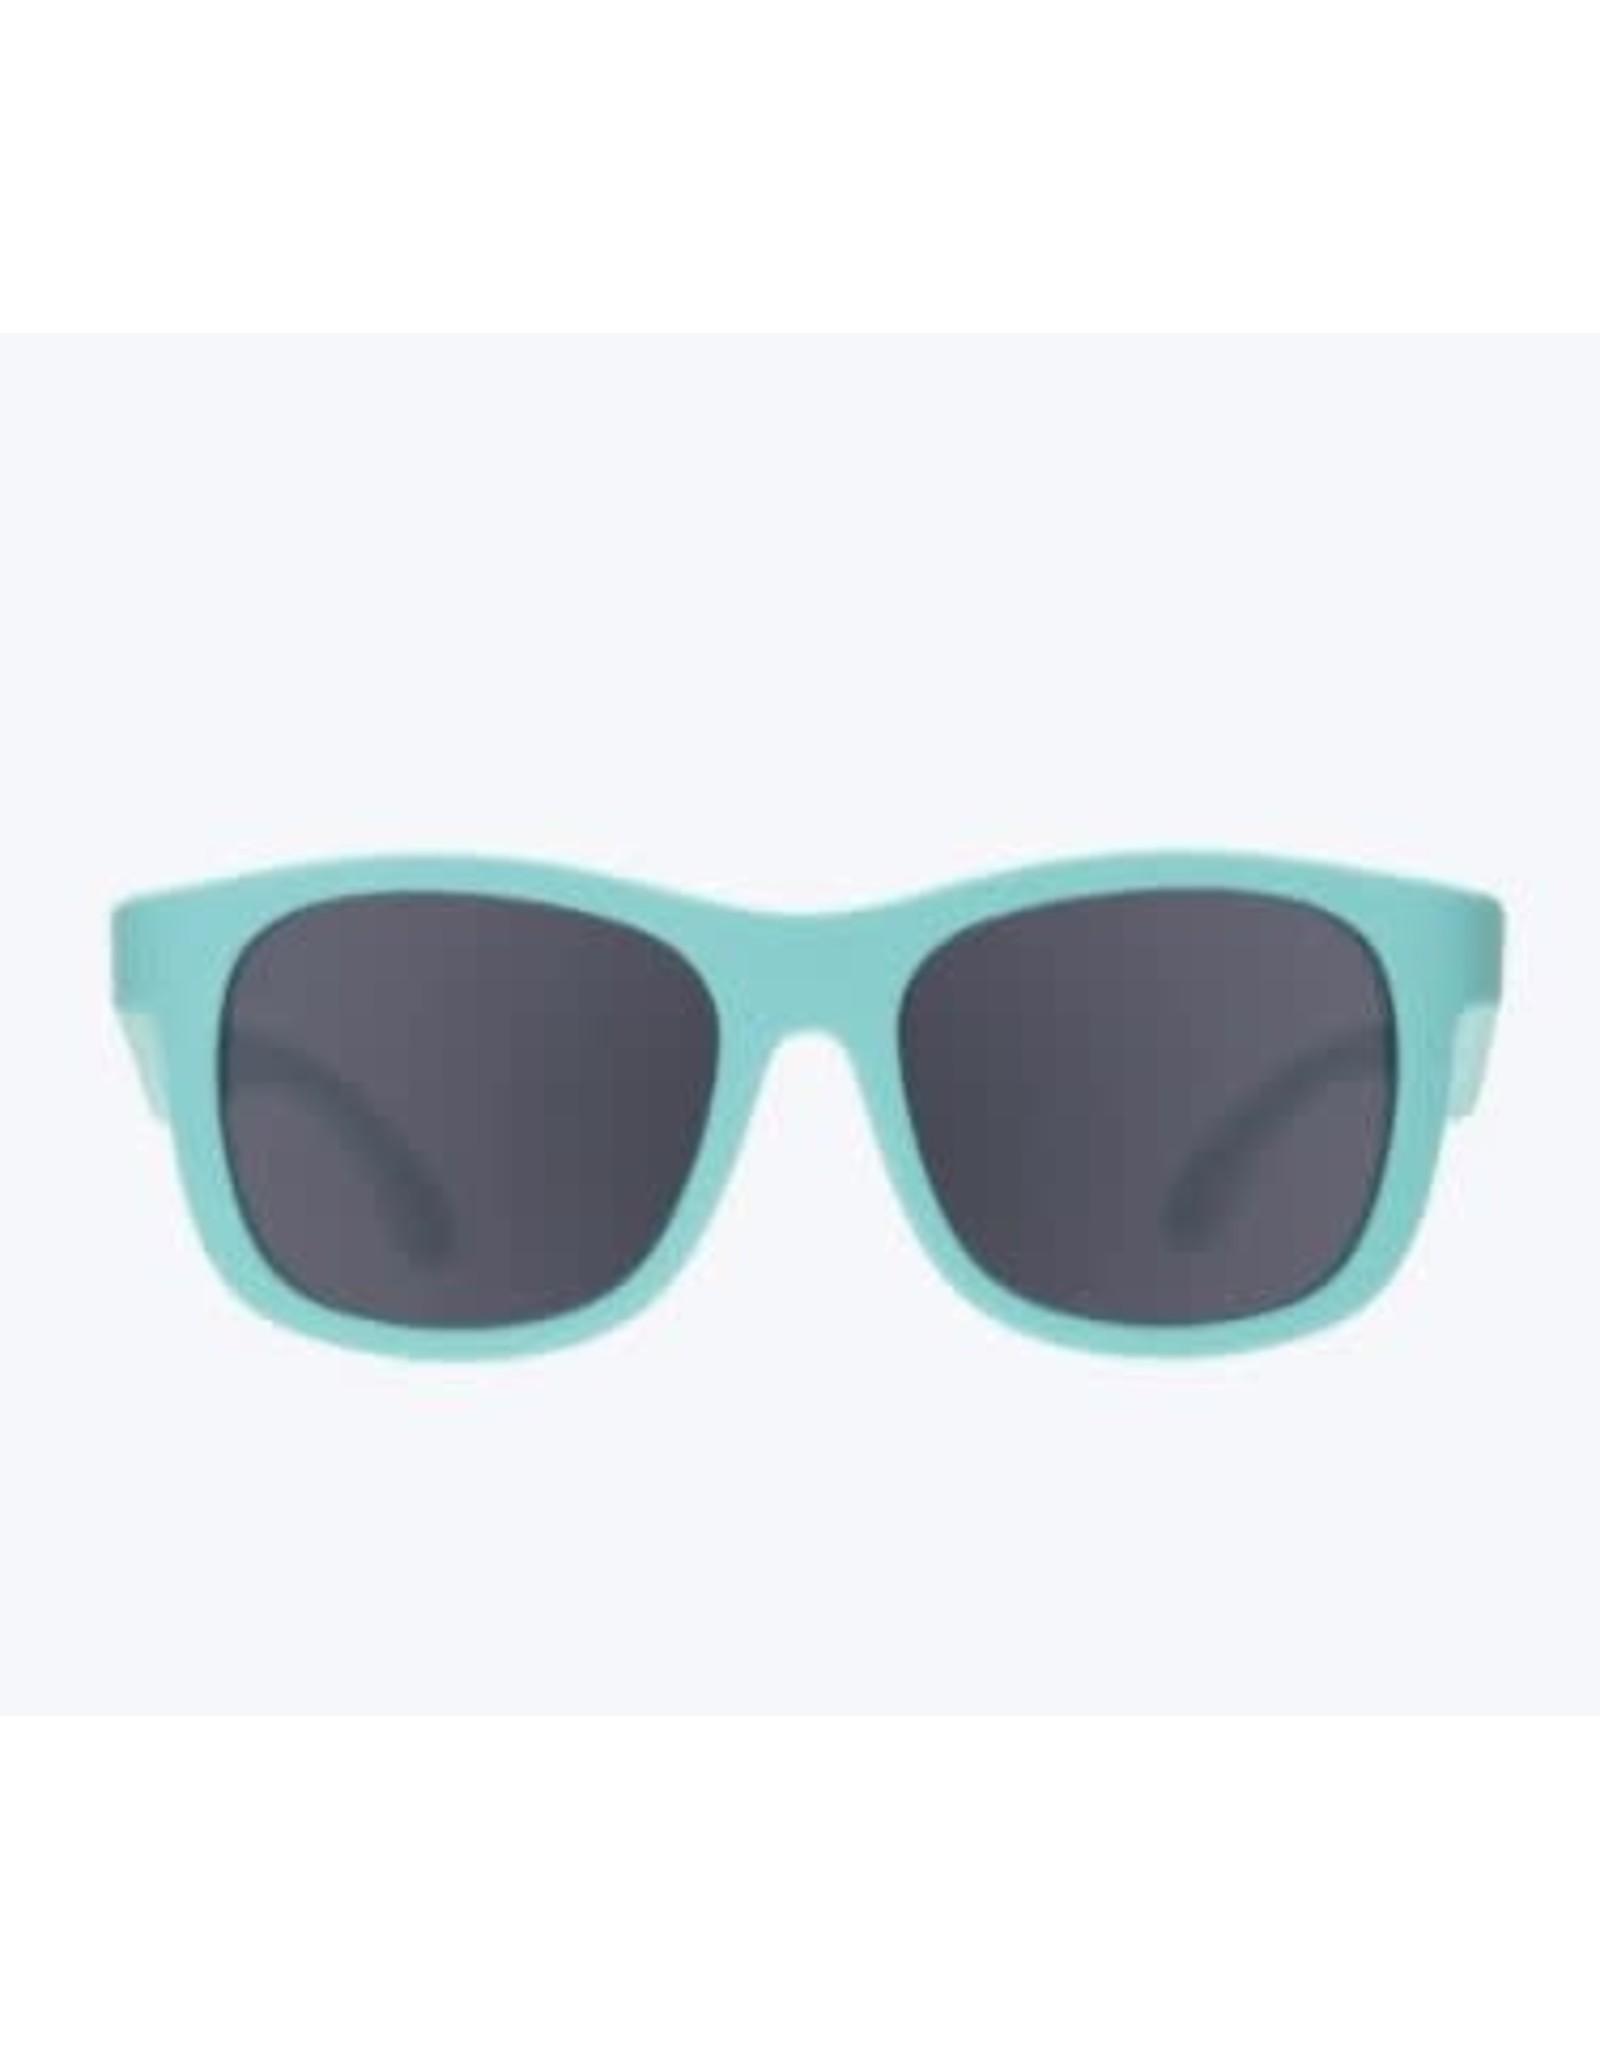 "Babiators ""Totally Turquoise"" Sunglasses"